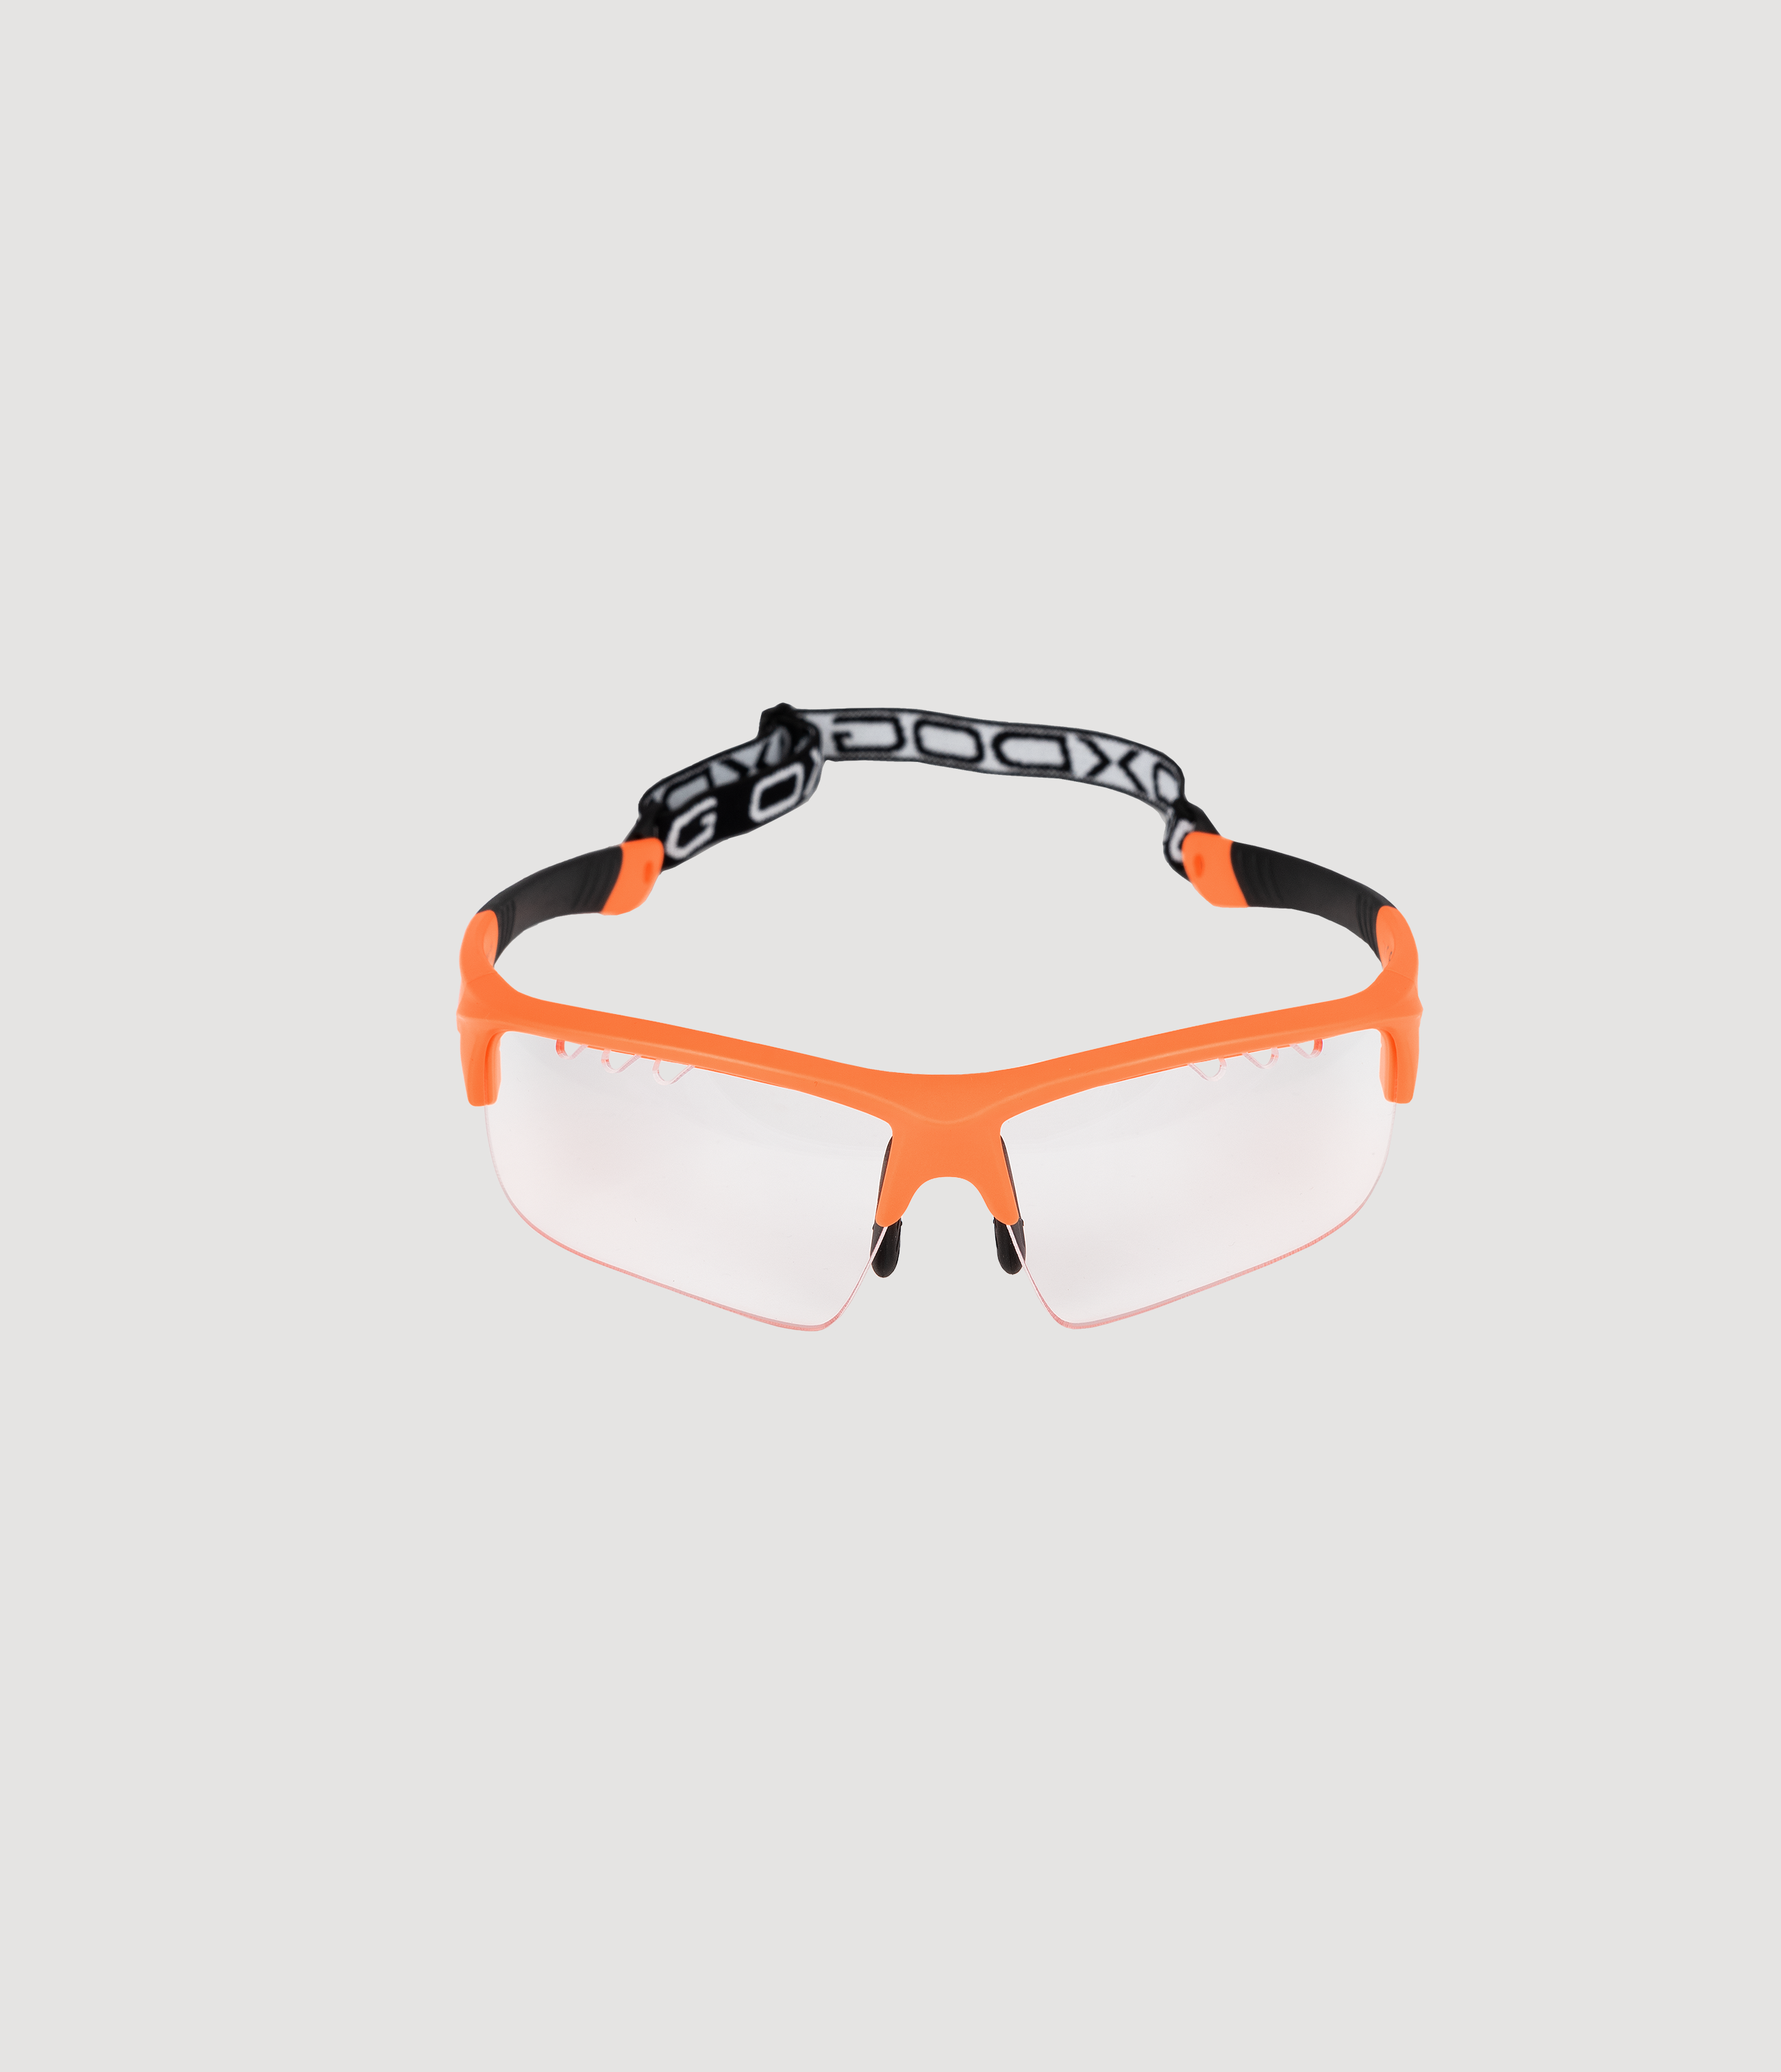 Spectrum Eyewear Orange Front